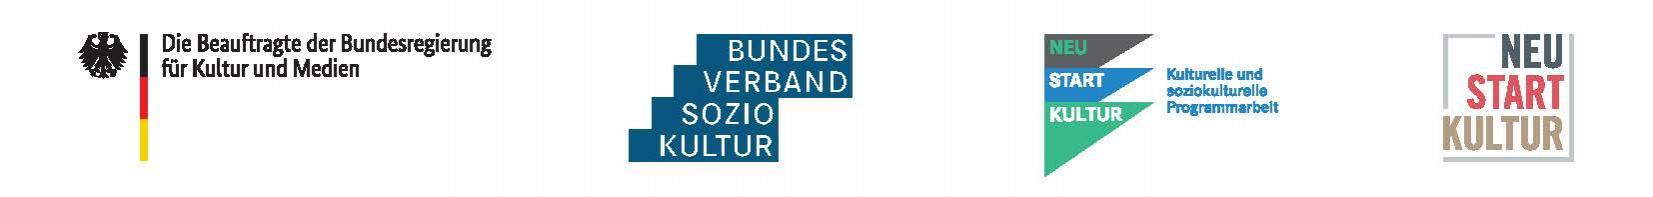 Logoleiste Neustart Kultur